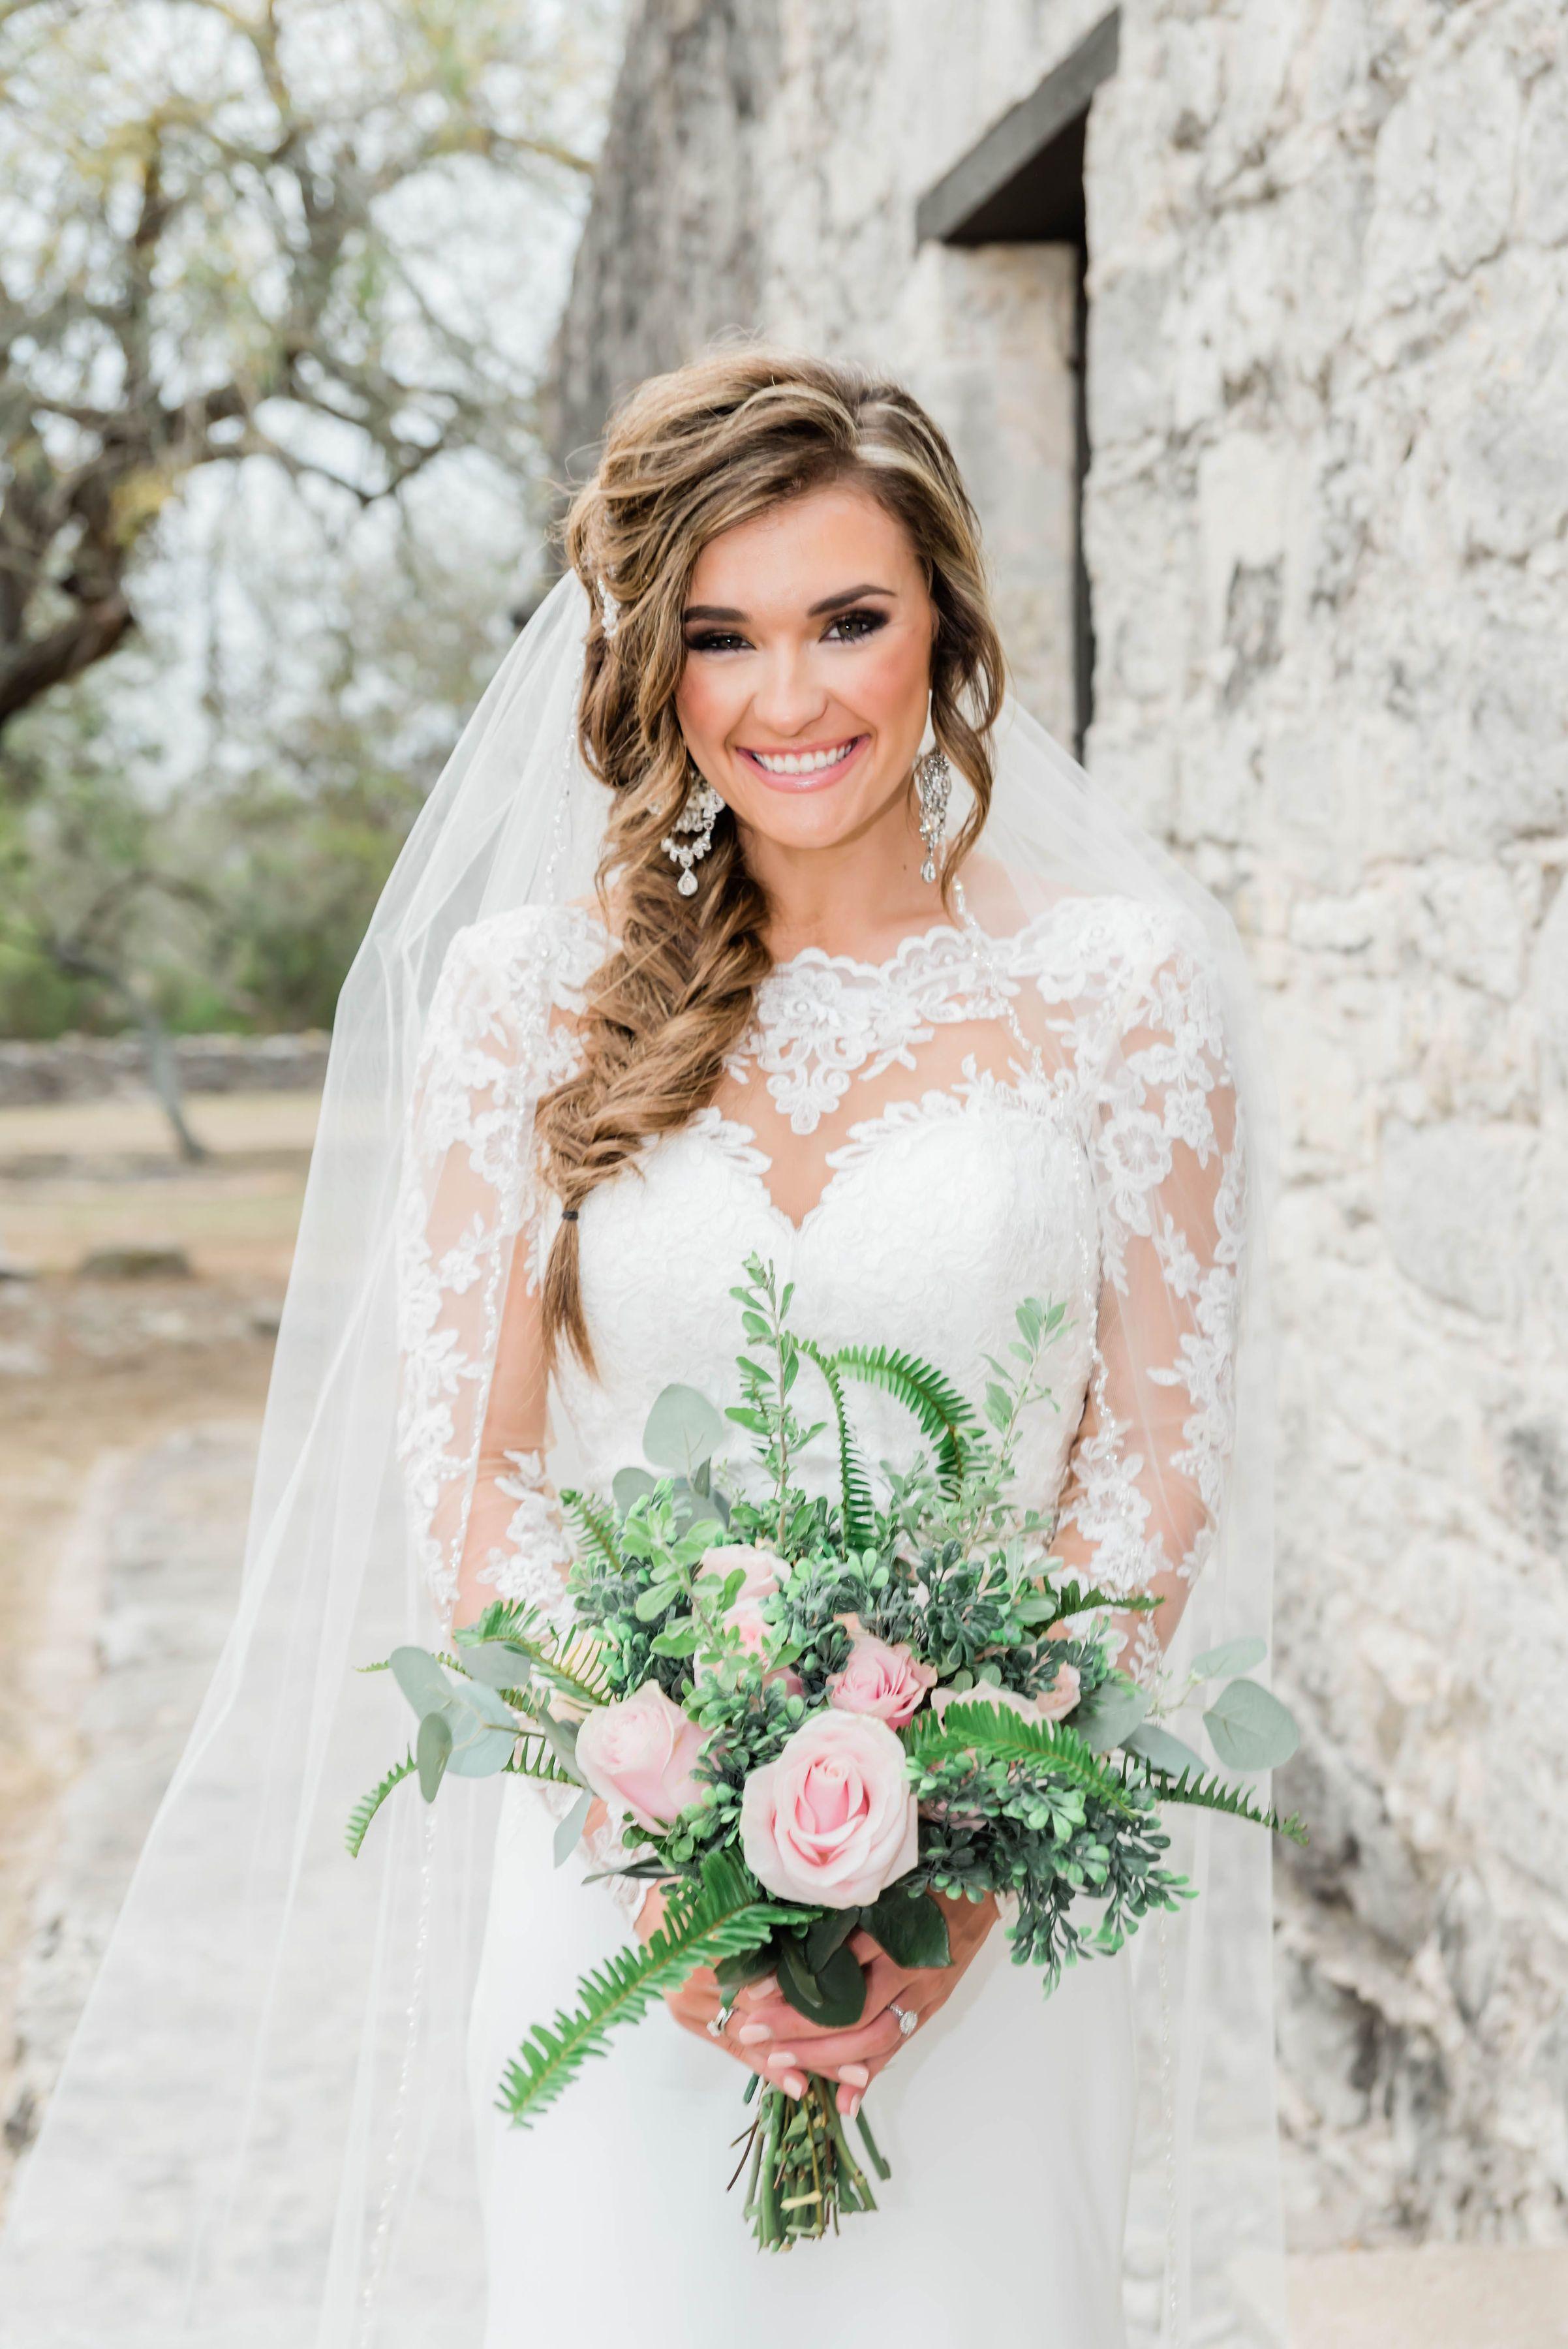 A Beautiful Lace Mermaid Wedding Dress In 2021 Wedding Dresses Lace Mermaid Wedding Dress Wedding Dresses Lace [ 3600 x 2403 Pixel ]